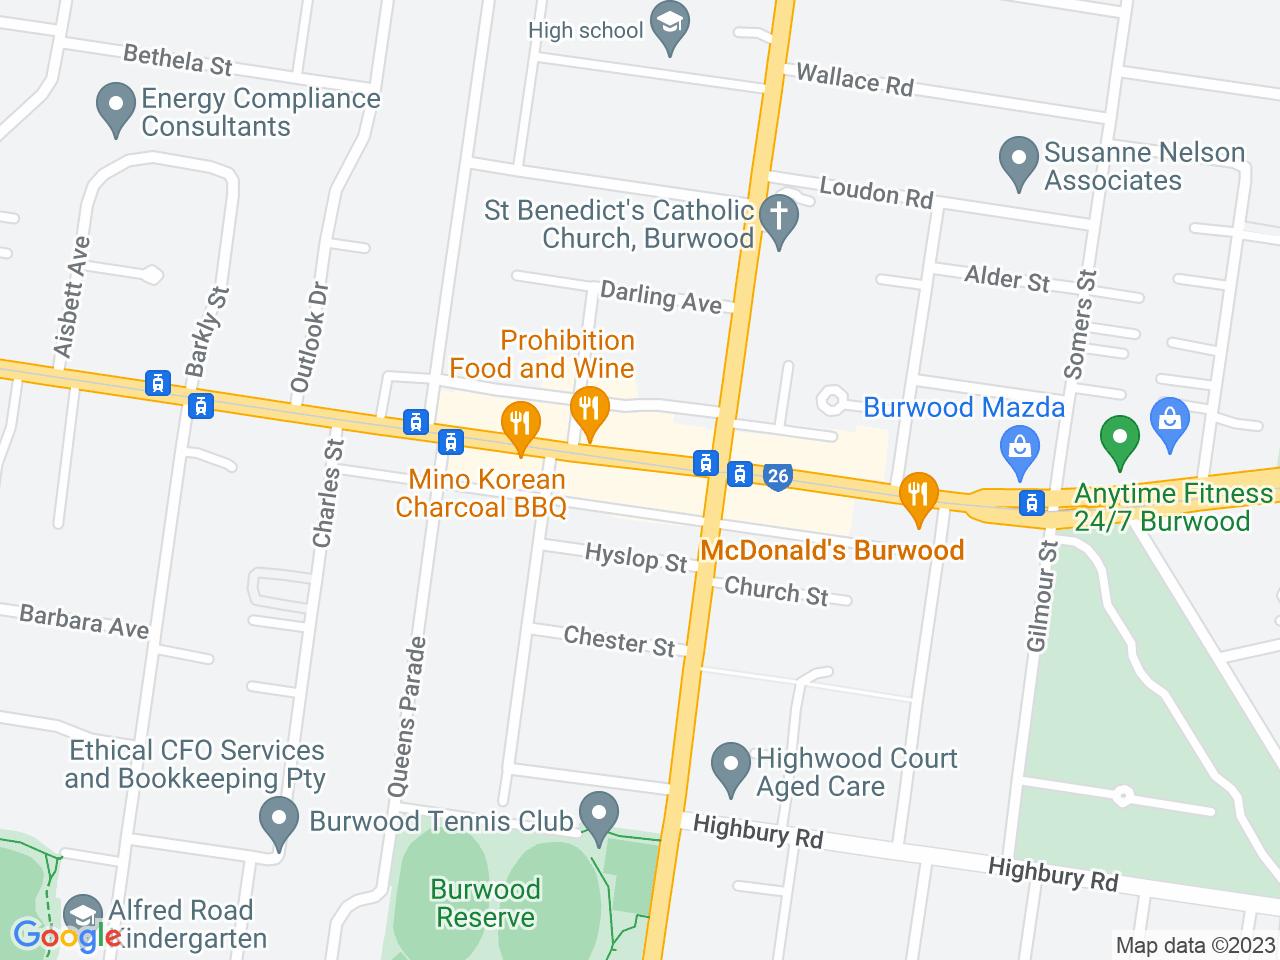 Google map: 1414 Toorak Rd, Camberwell VIC 3124, Australia